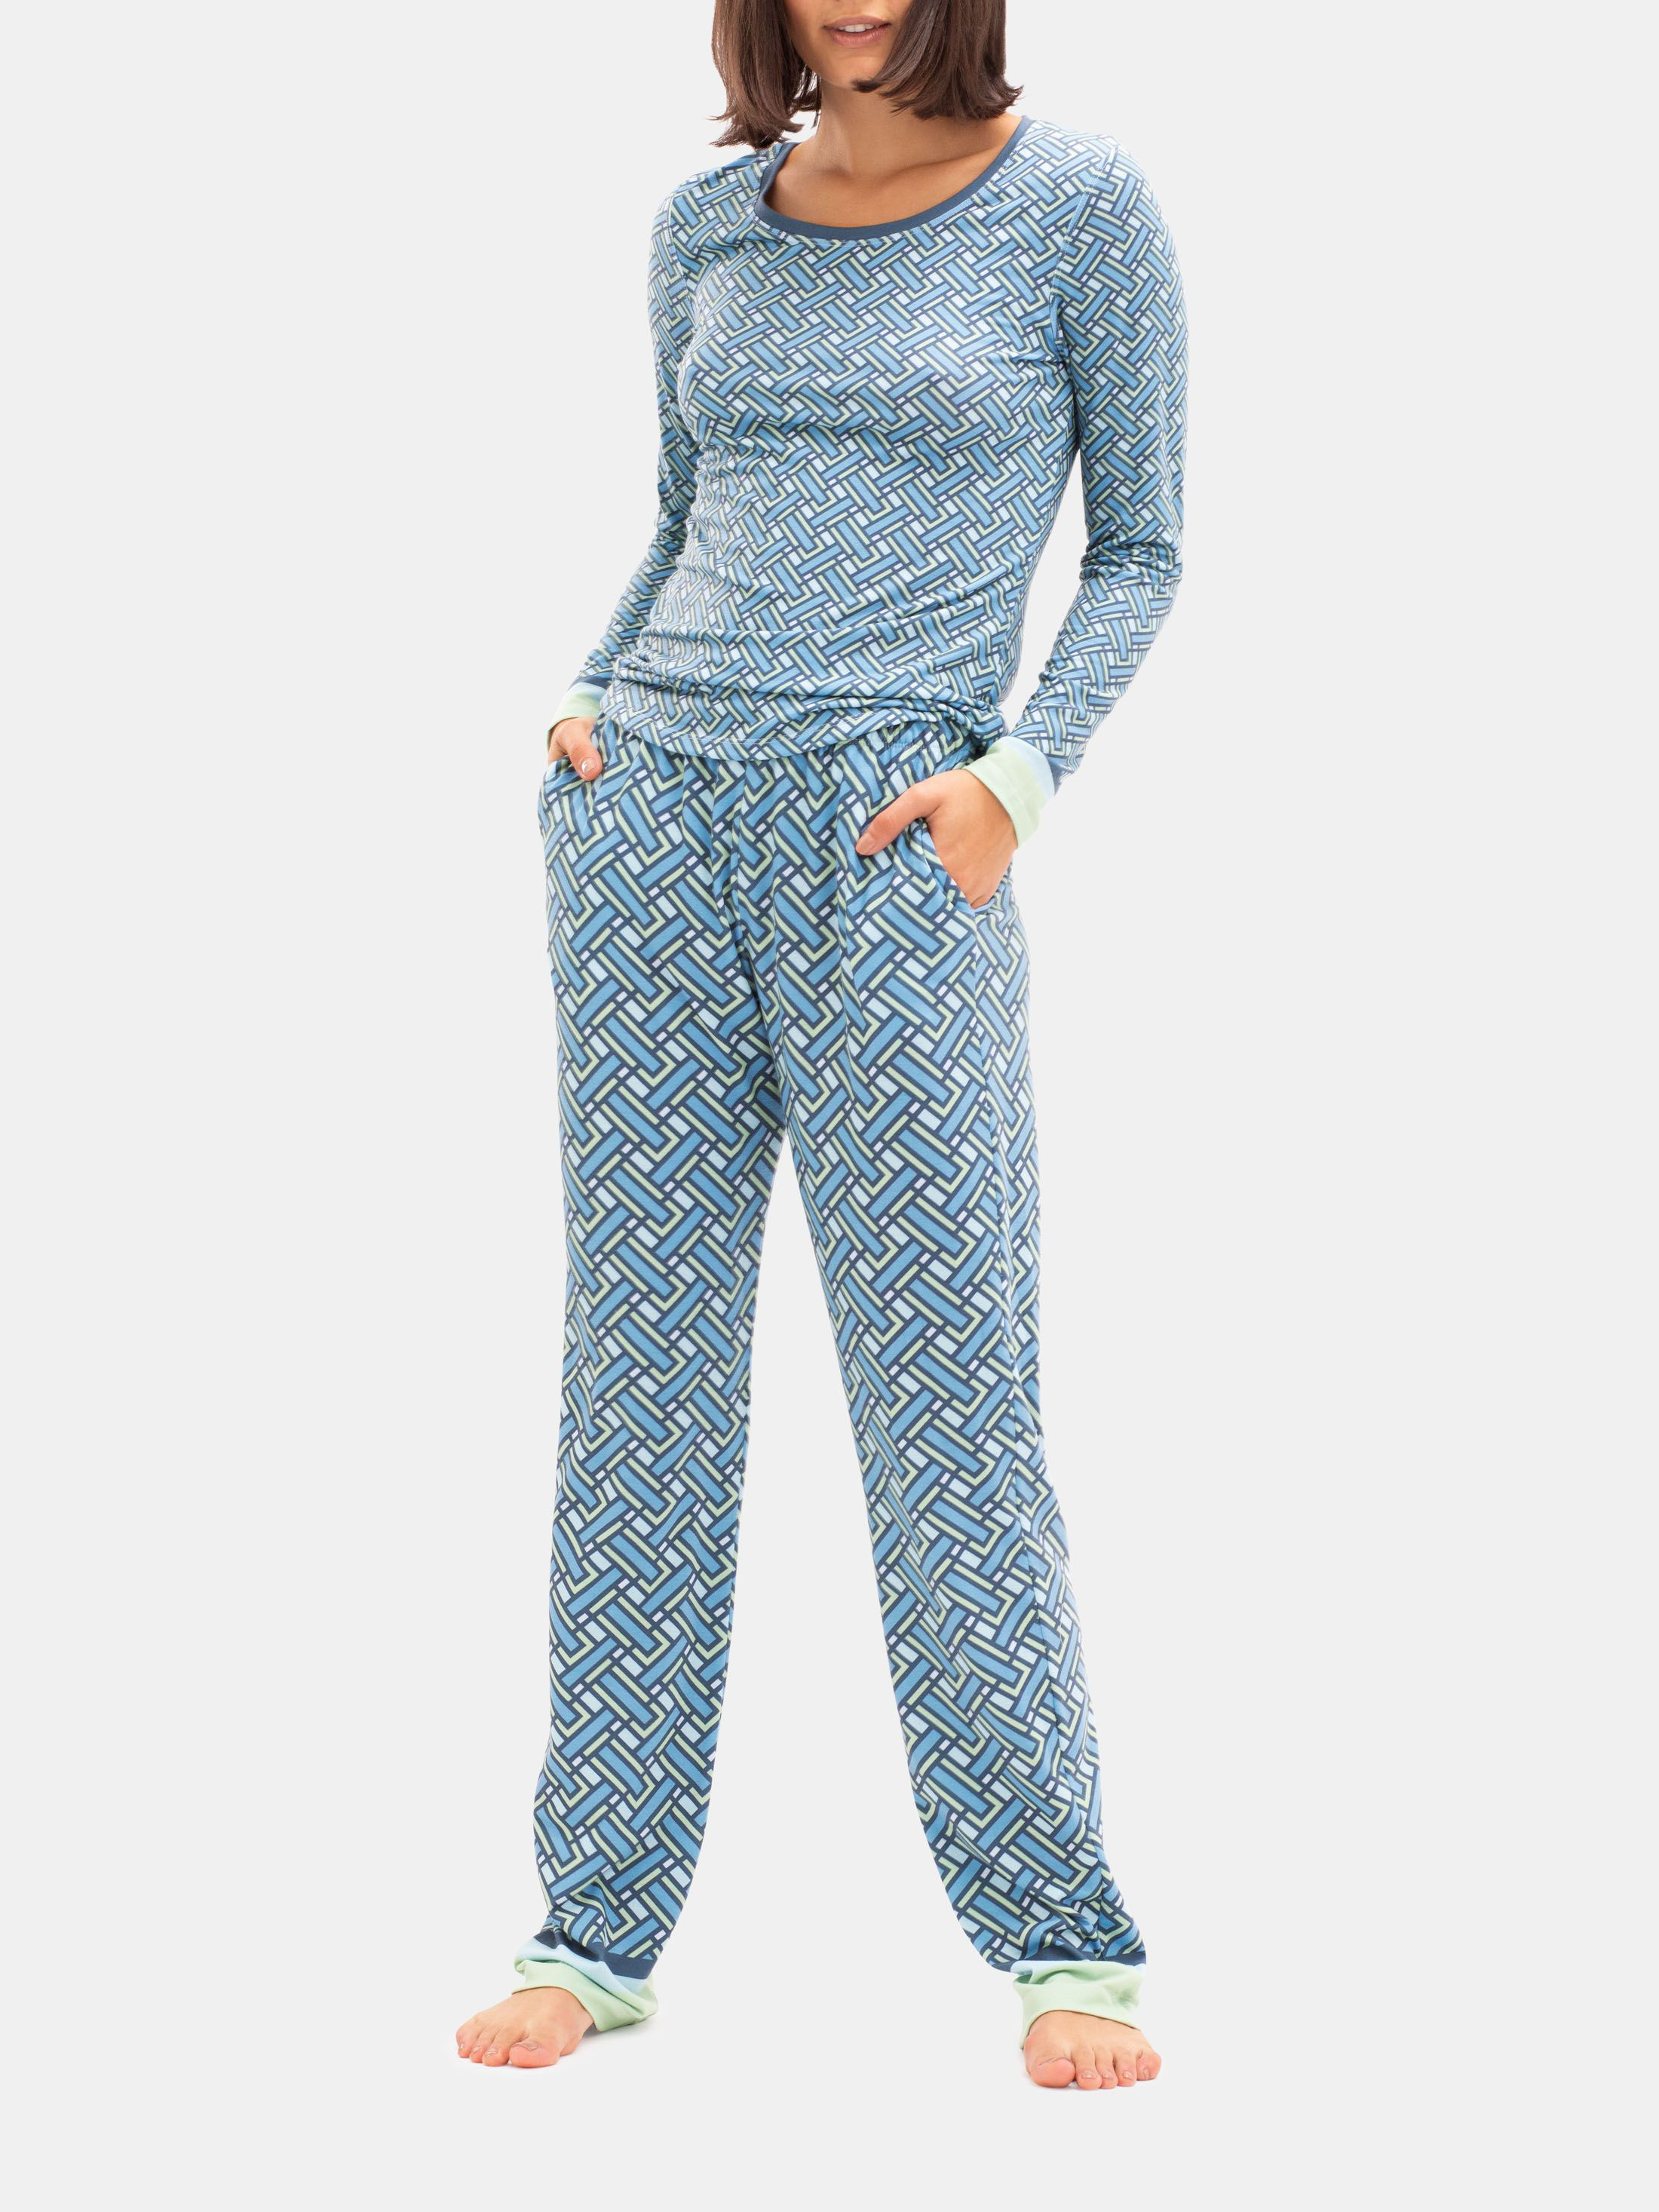 Pyjama sur mesure